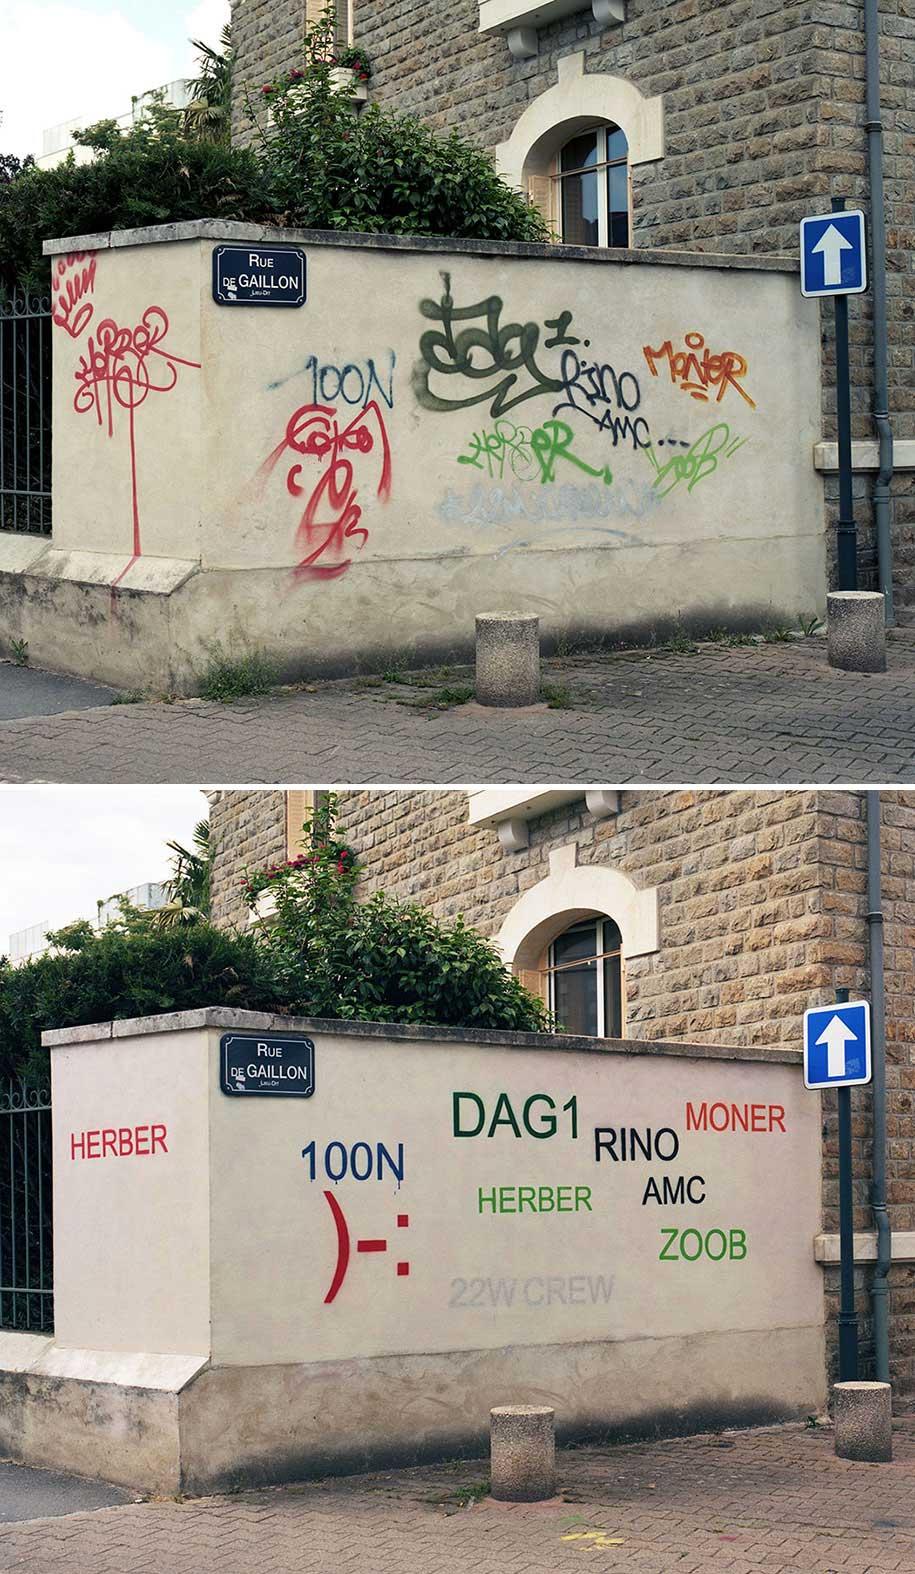 Mathieu Tremblin macht Graffiti-Tags leserlich Mathieu-Tremblin-tag-clouds-graffiti_02